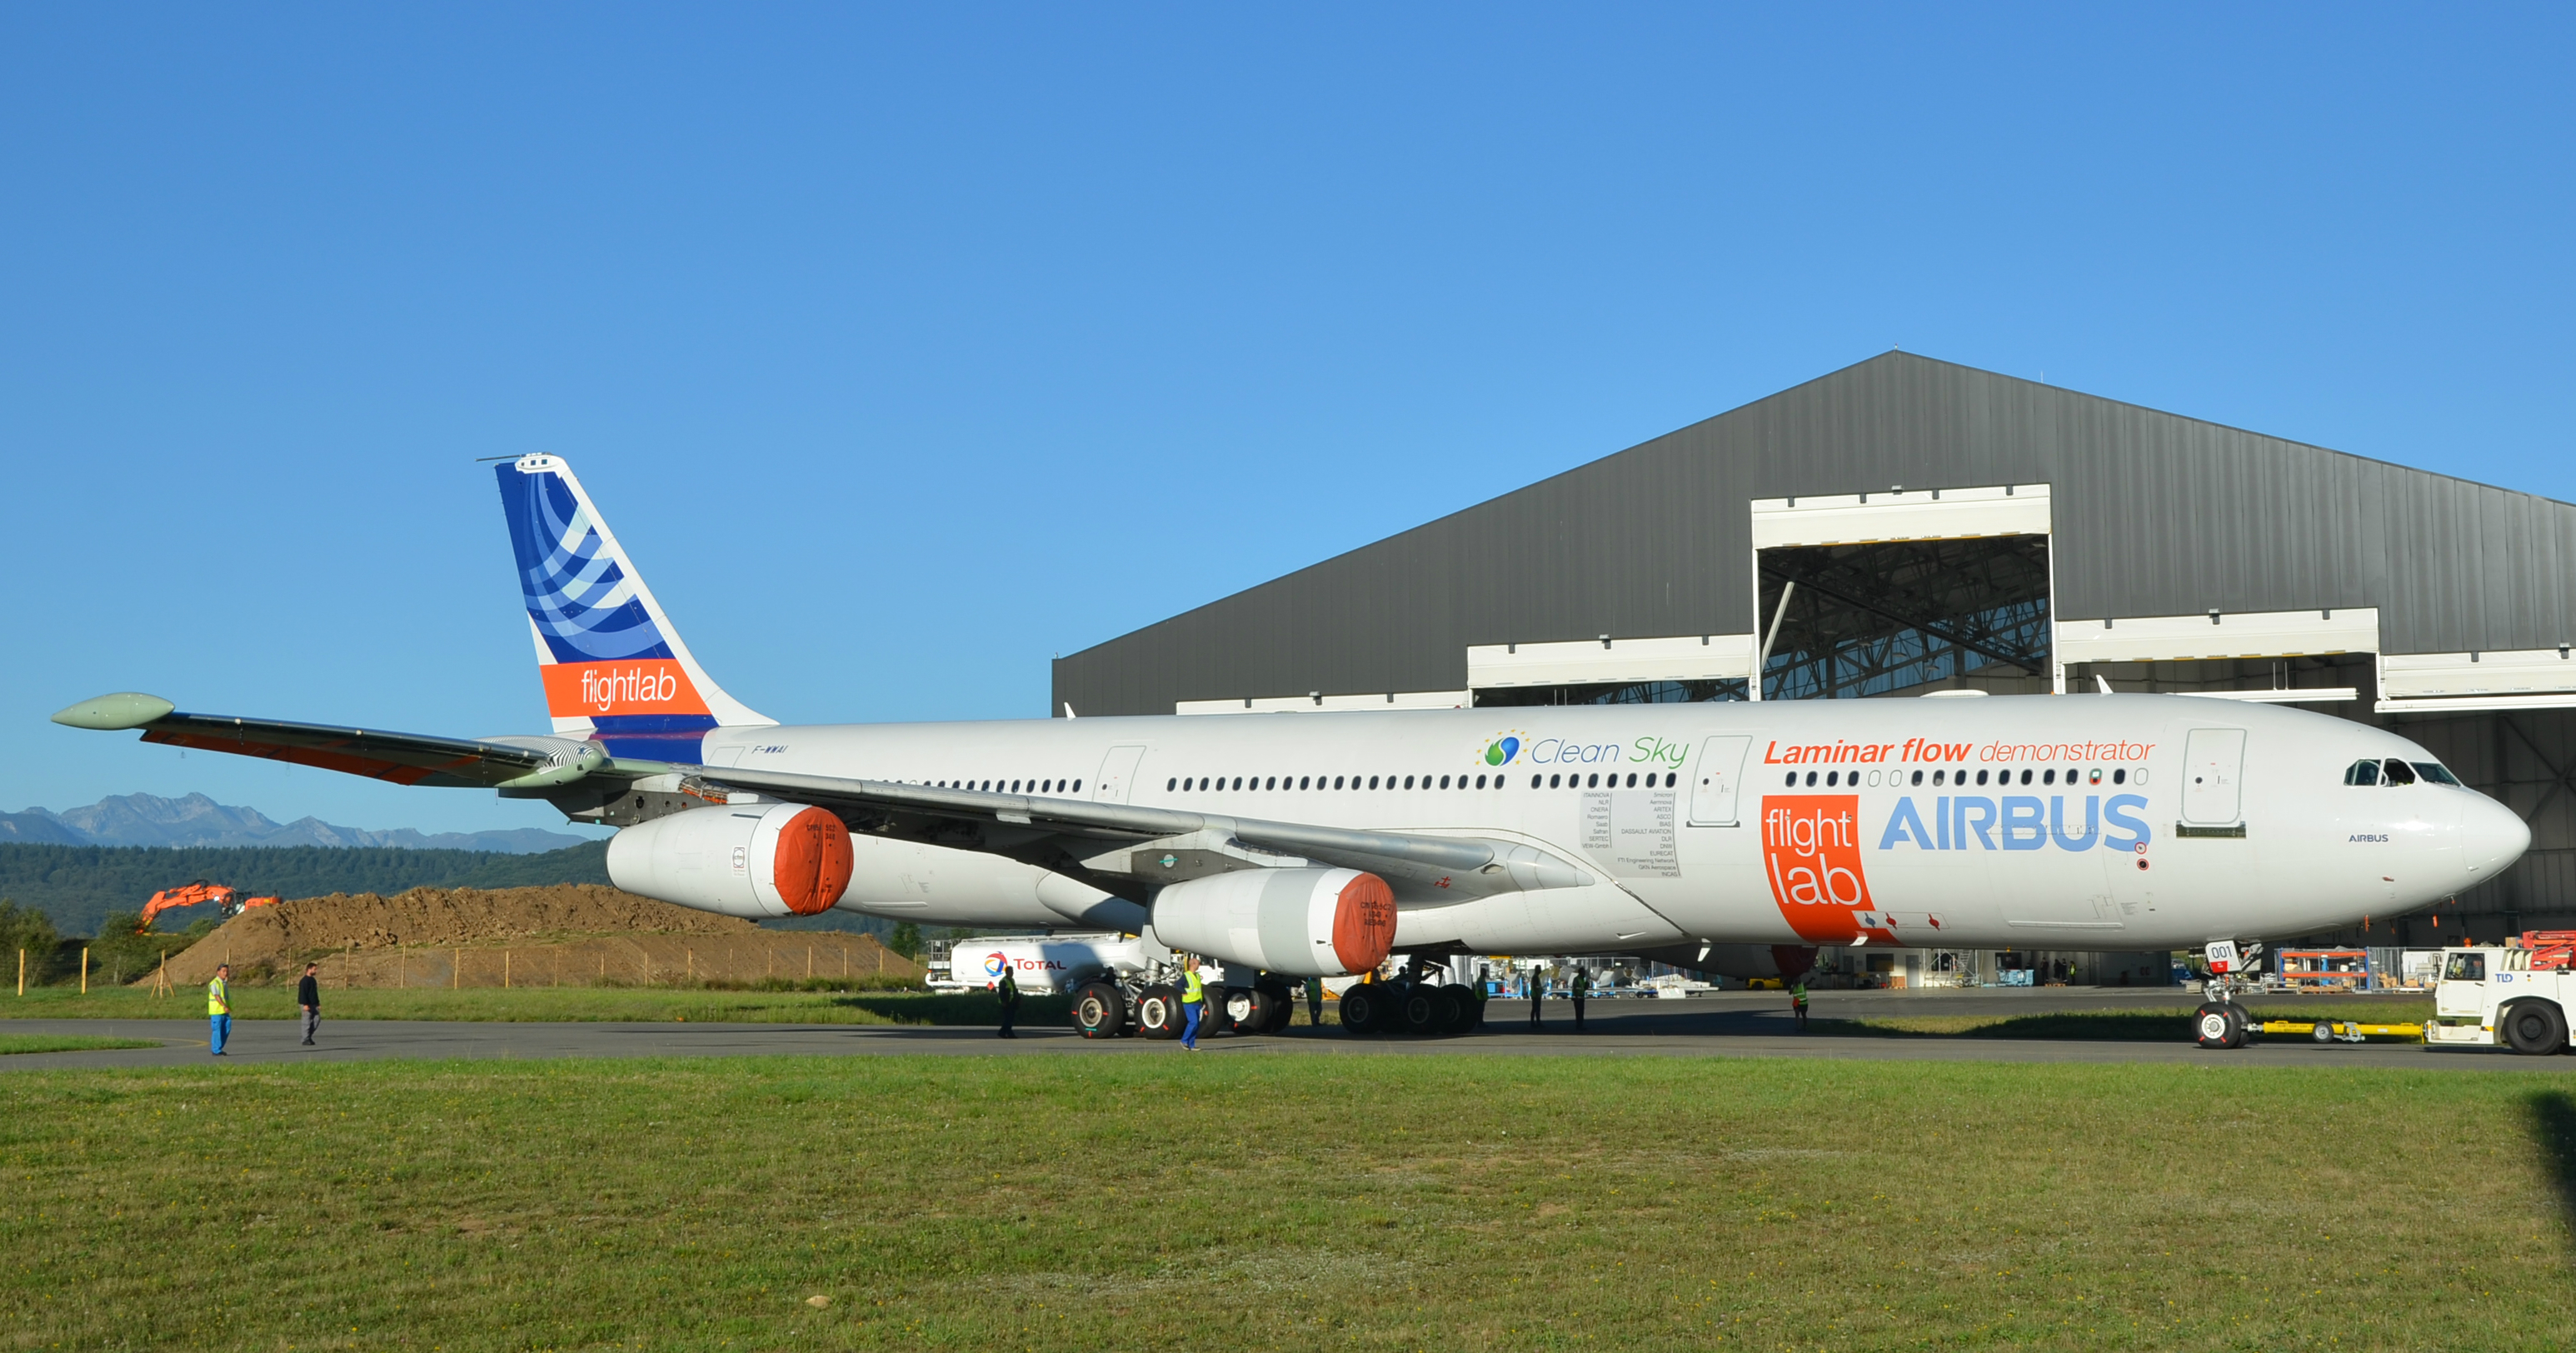 Airbus A340 BLADE test aircraft